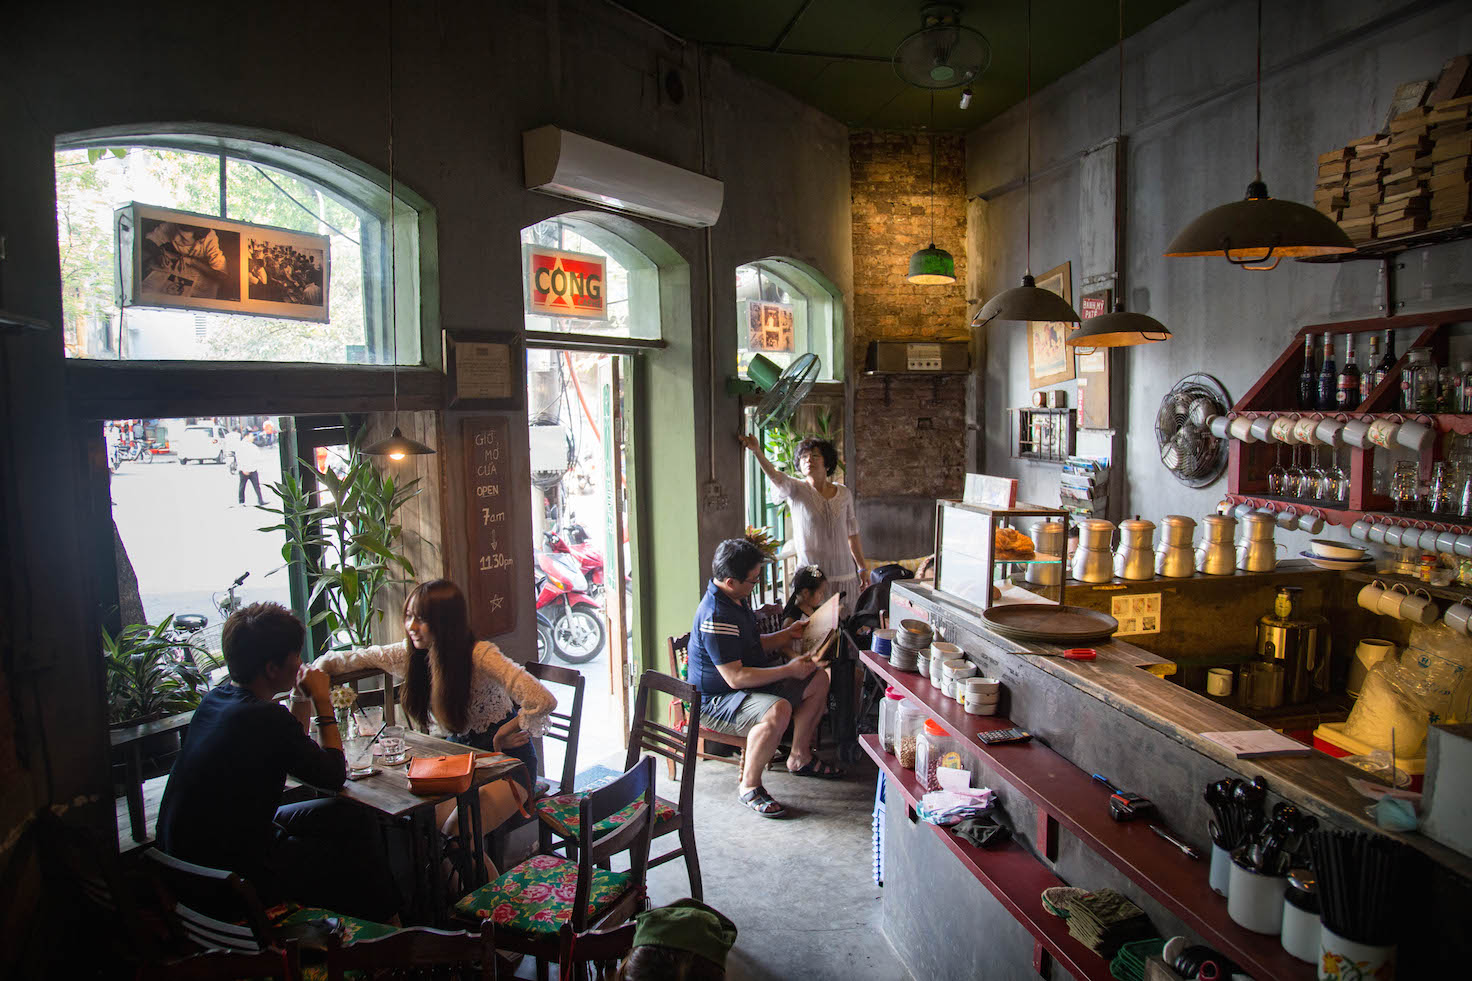 Hanoi-cong caphe